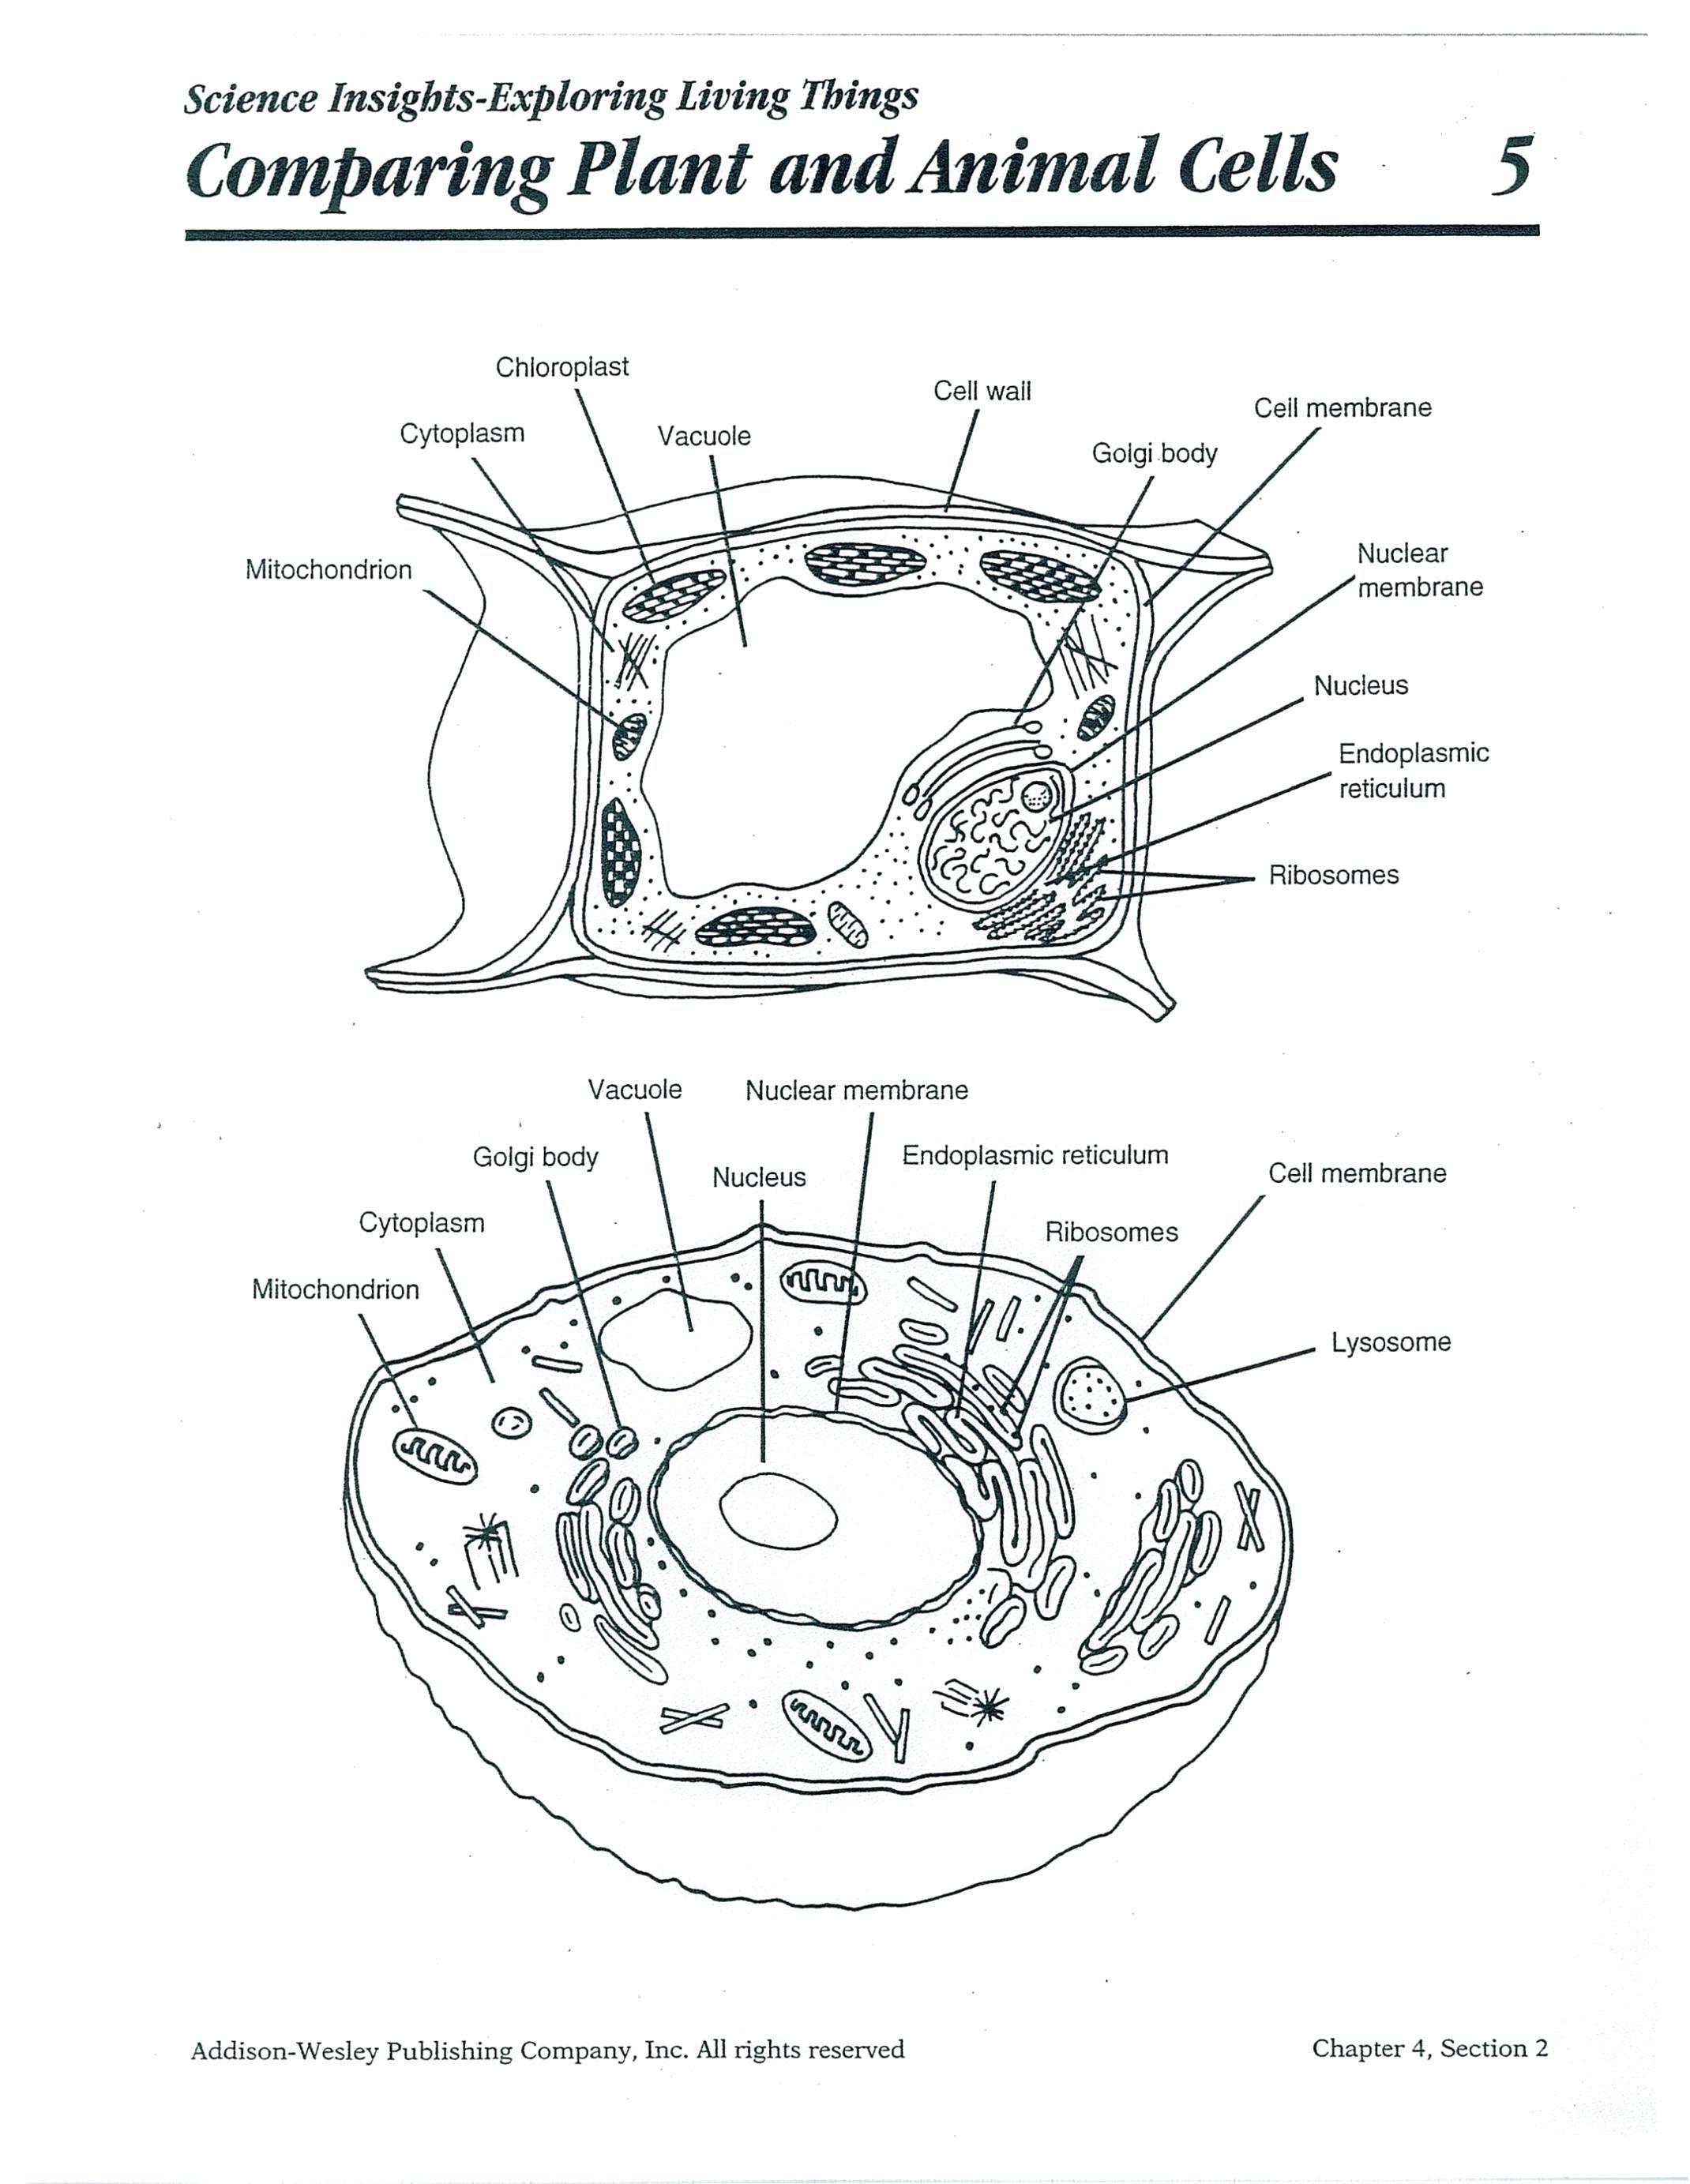 33 Simple Water Cycle Worksheet Design Http Ygdravil Info 33 Simple Water Cycle Worksheet Desi Cells Worksheet Plant And Animal Cells Plant Cells Worksheet [ 2766 x 2140 Pixel ]